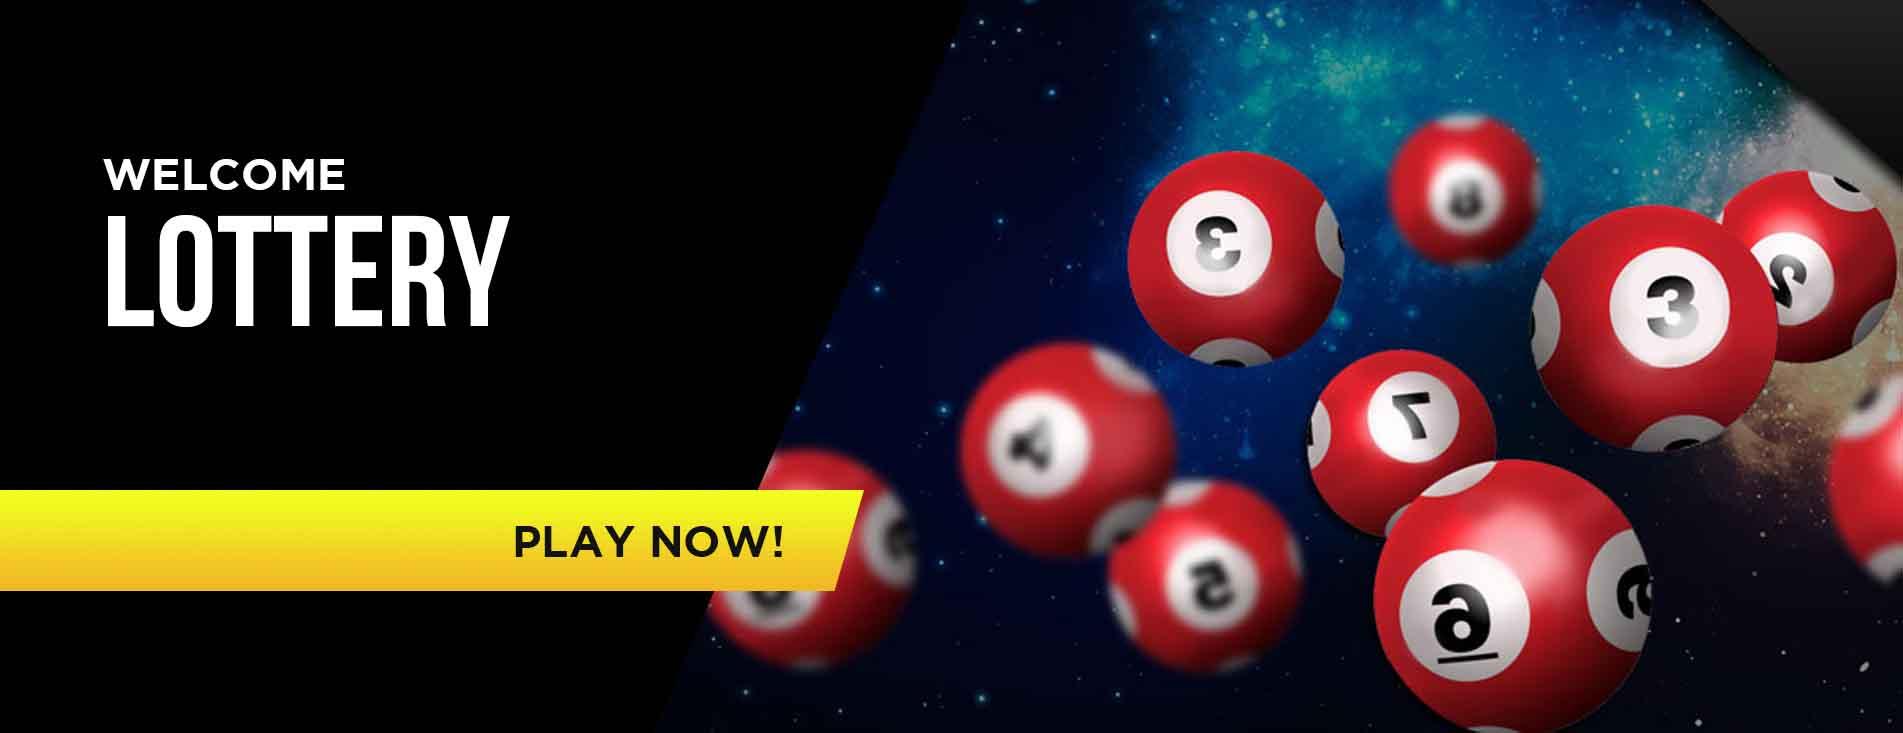 lottery-banner-online-bet